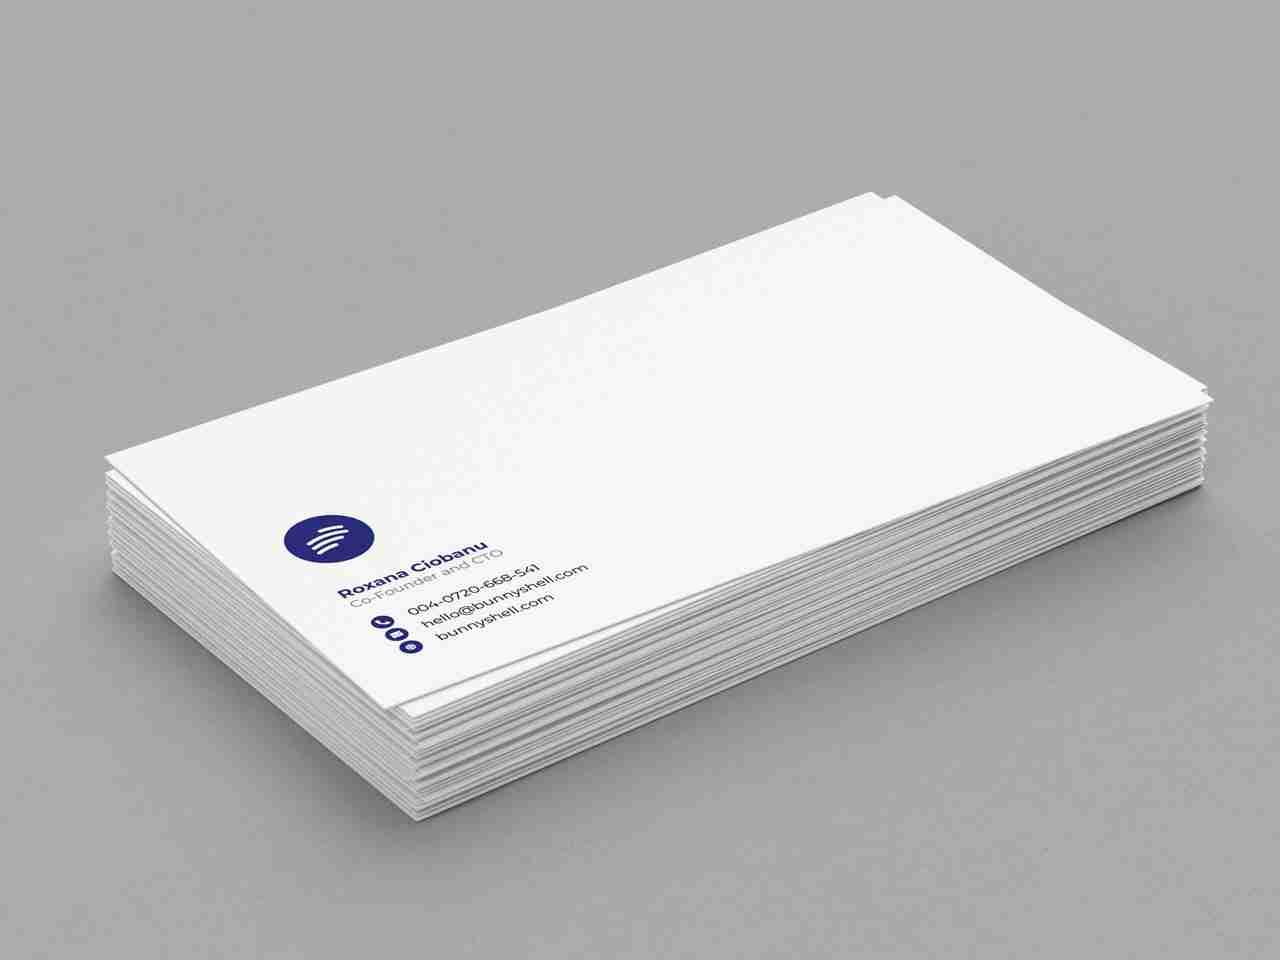 Name Card Design for BunnyShell